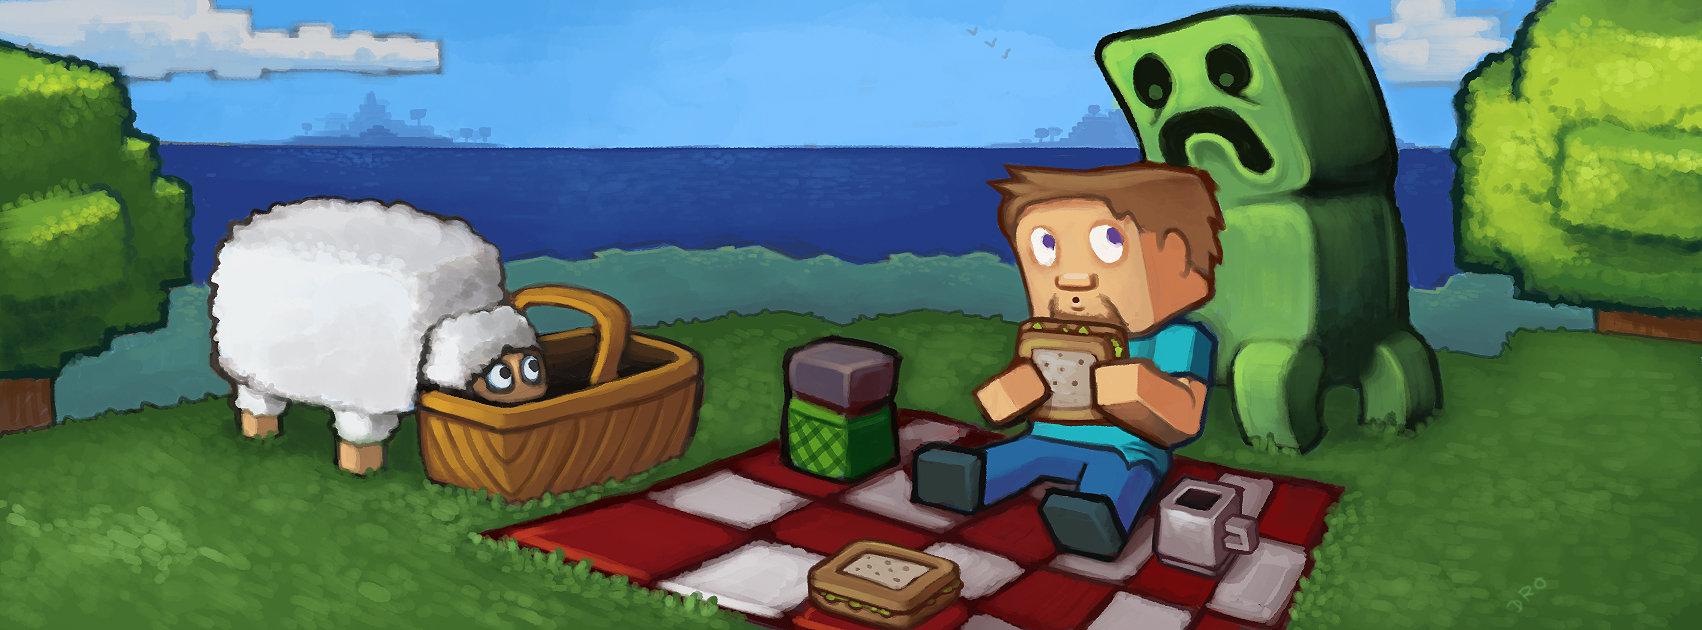 Daniel ribera olsen minecraft picnic